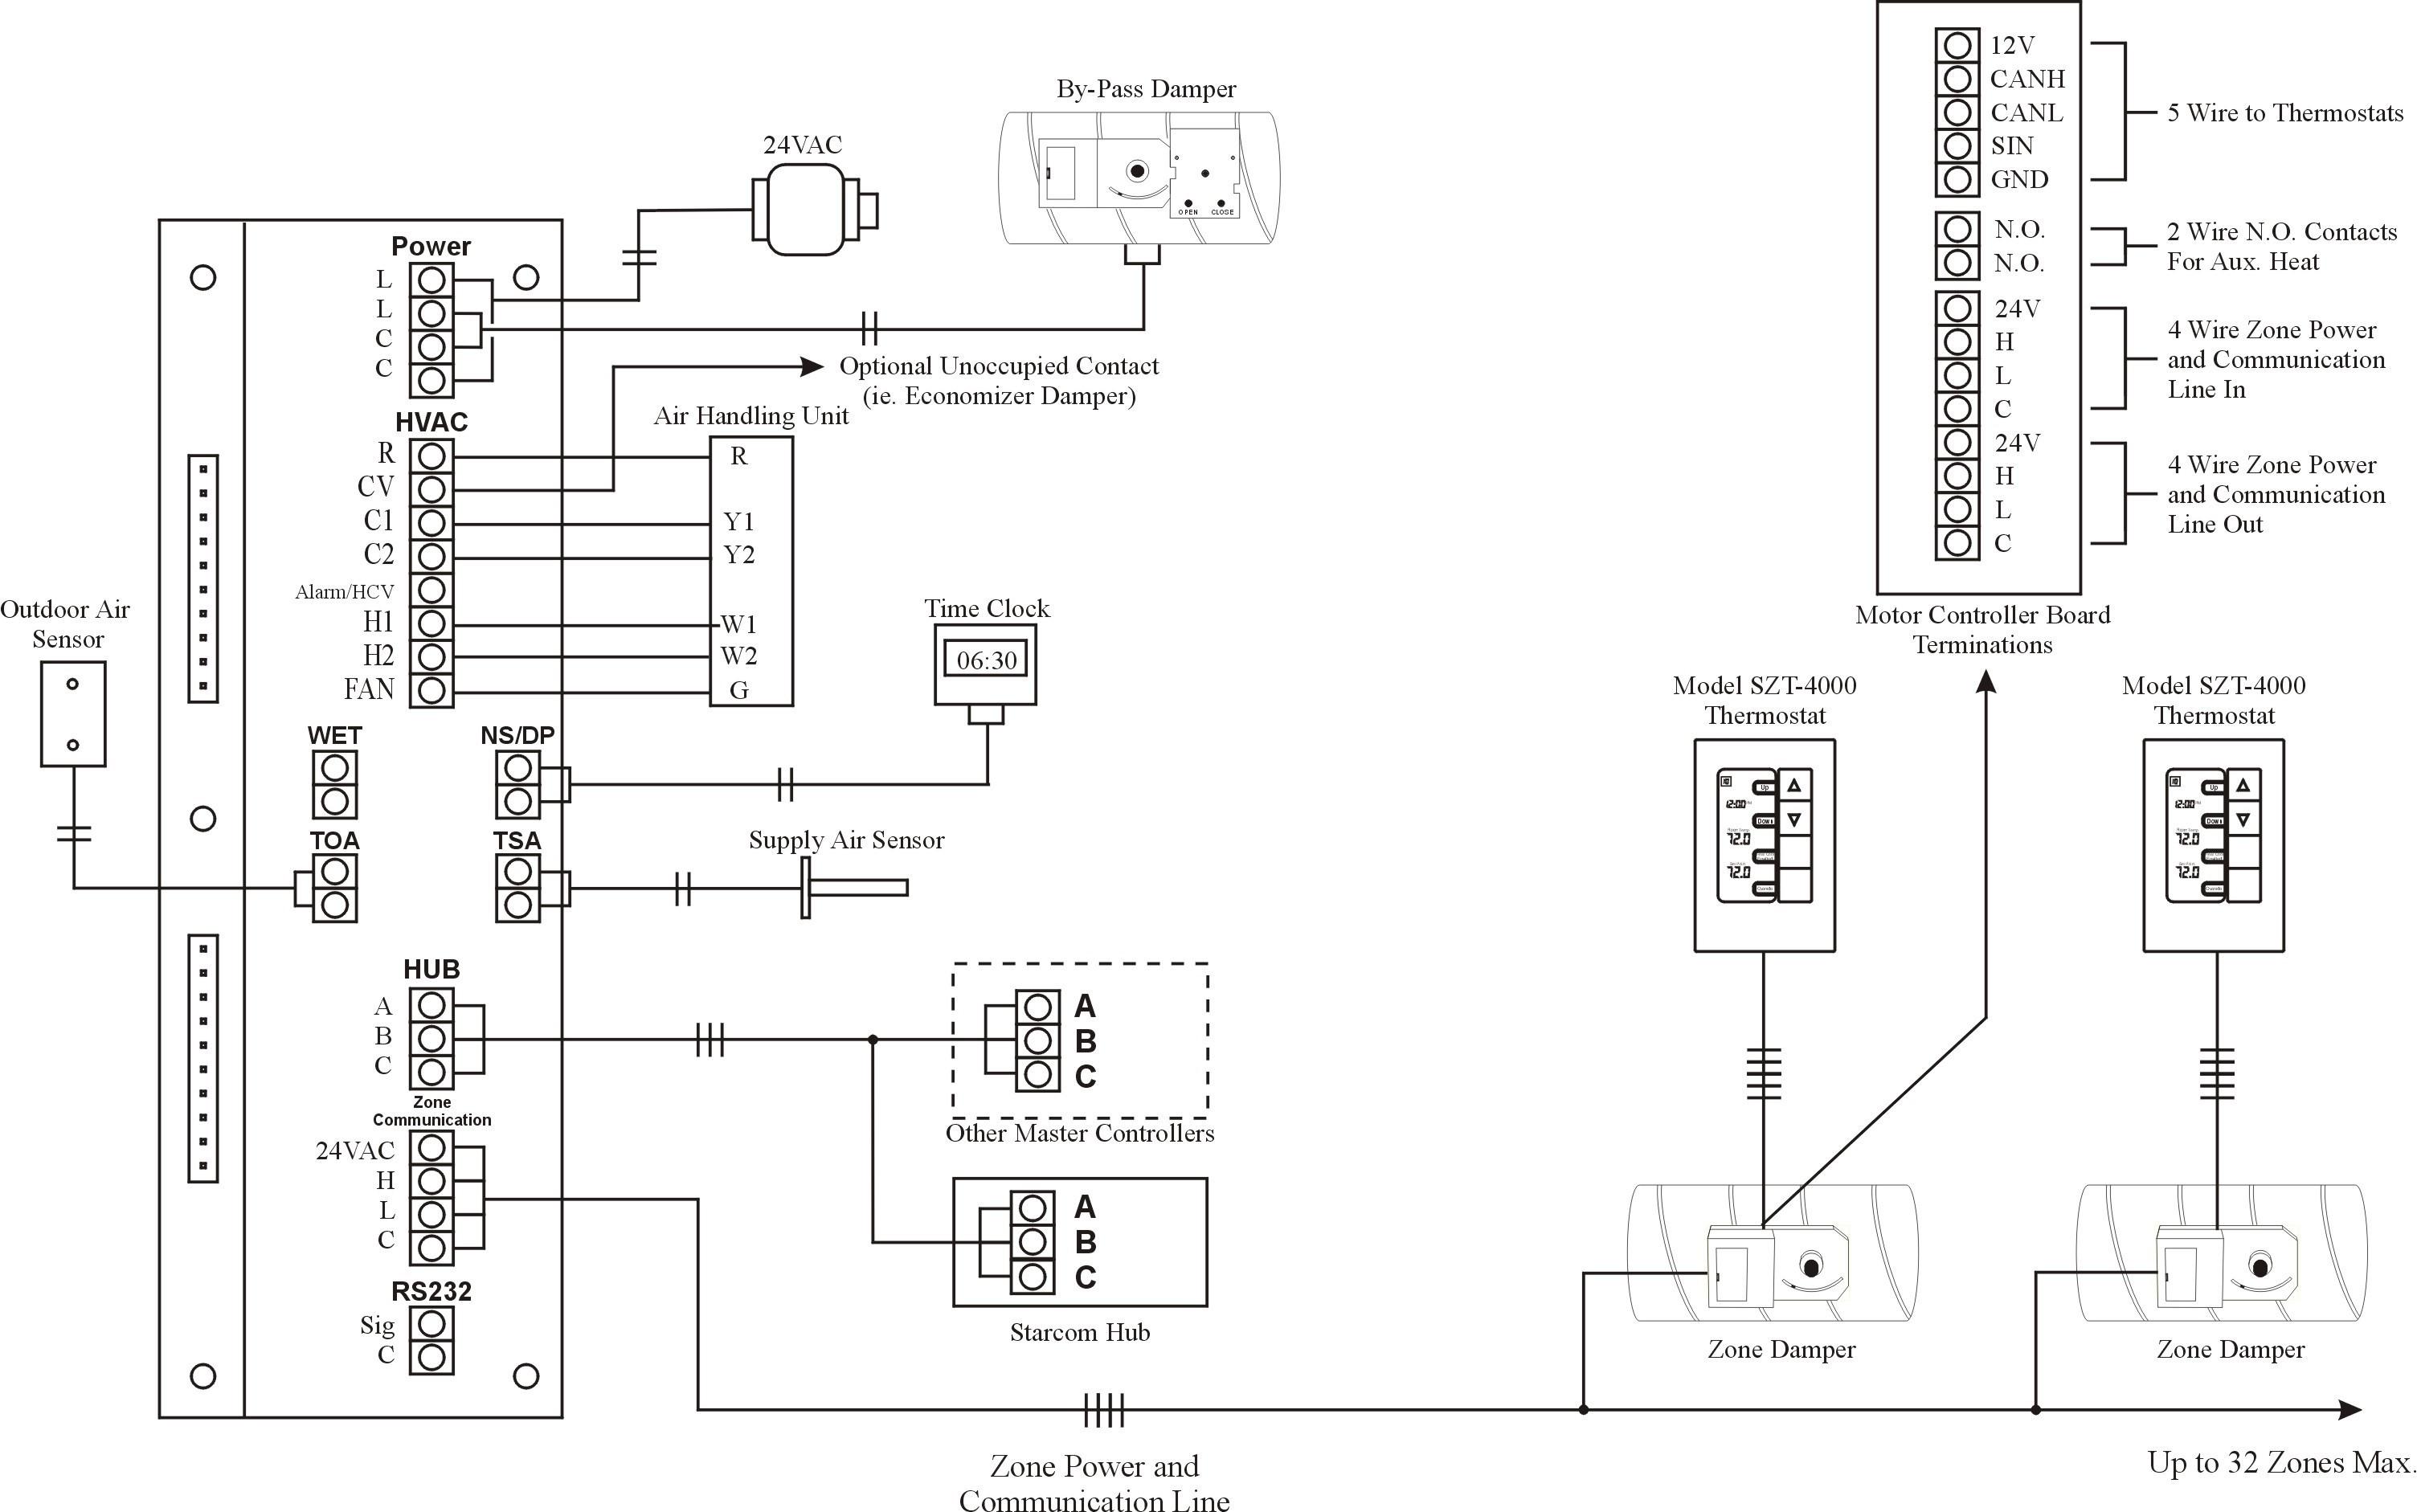 2007 Ford Mustang Alarm Wiring - Wiring Diagrams Rename F Wiring Diagram on